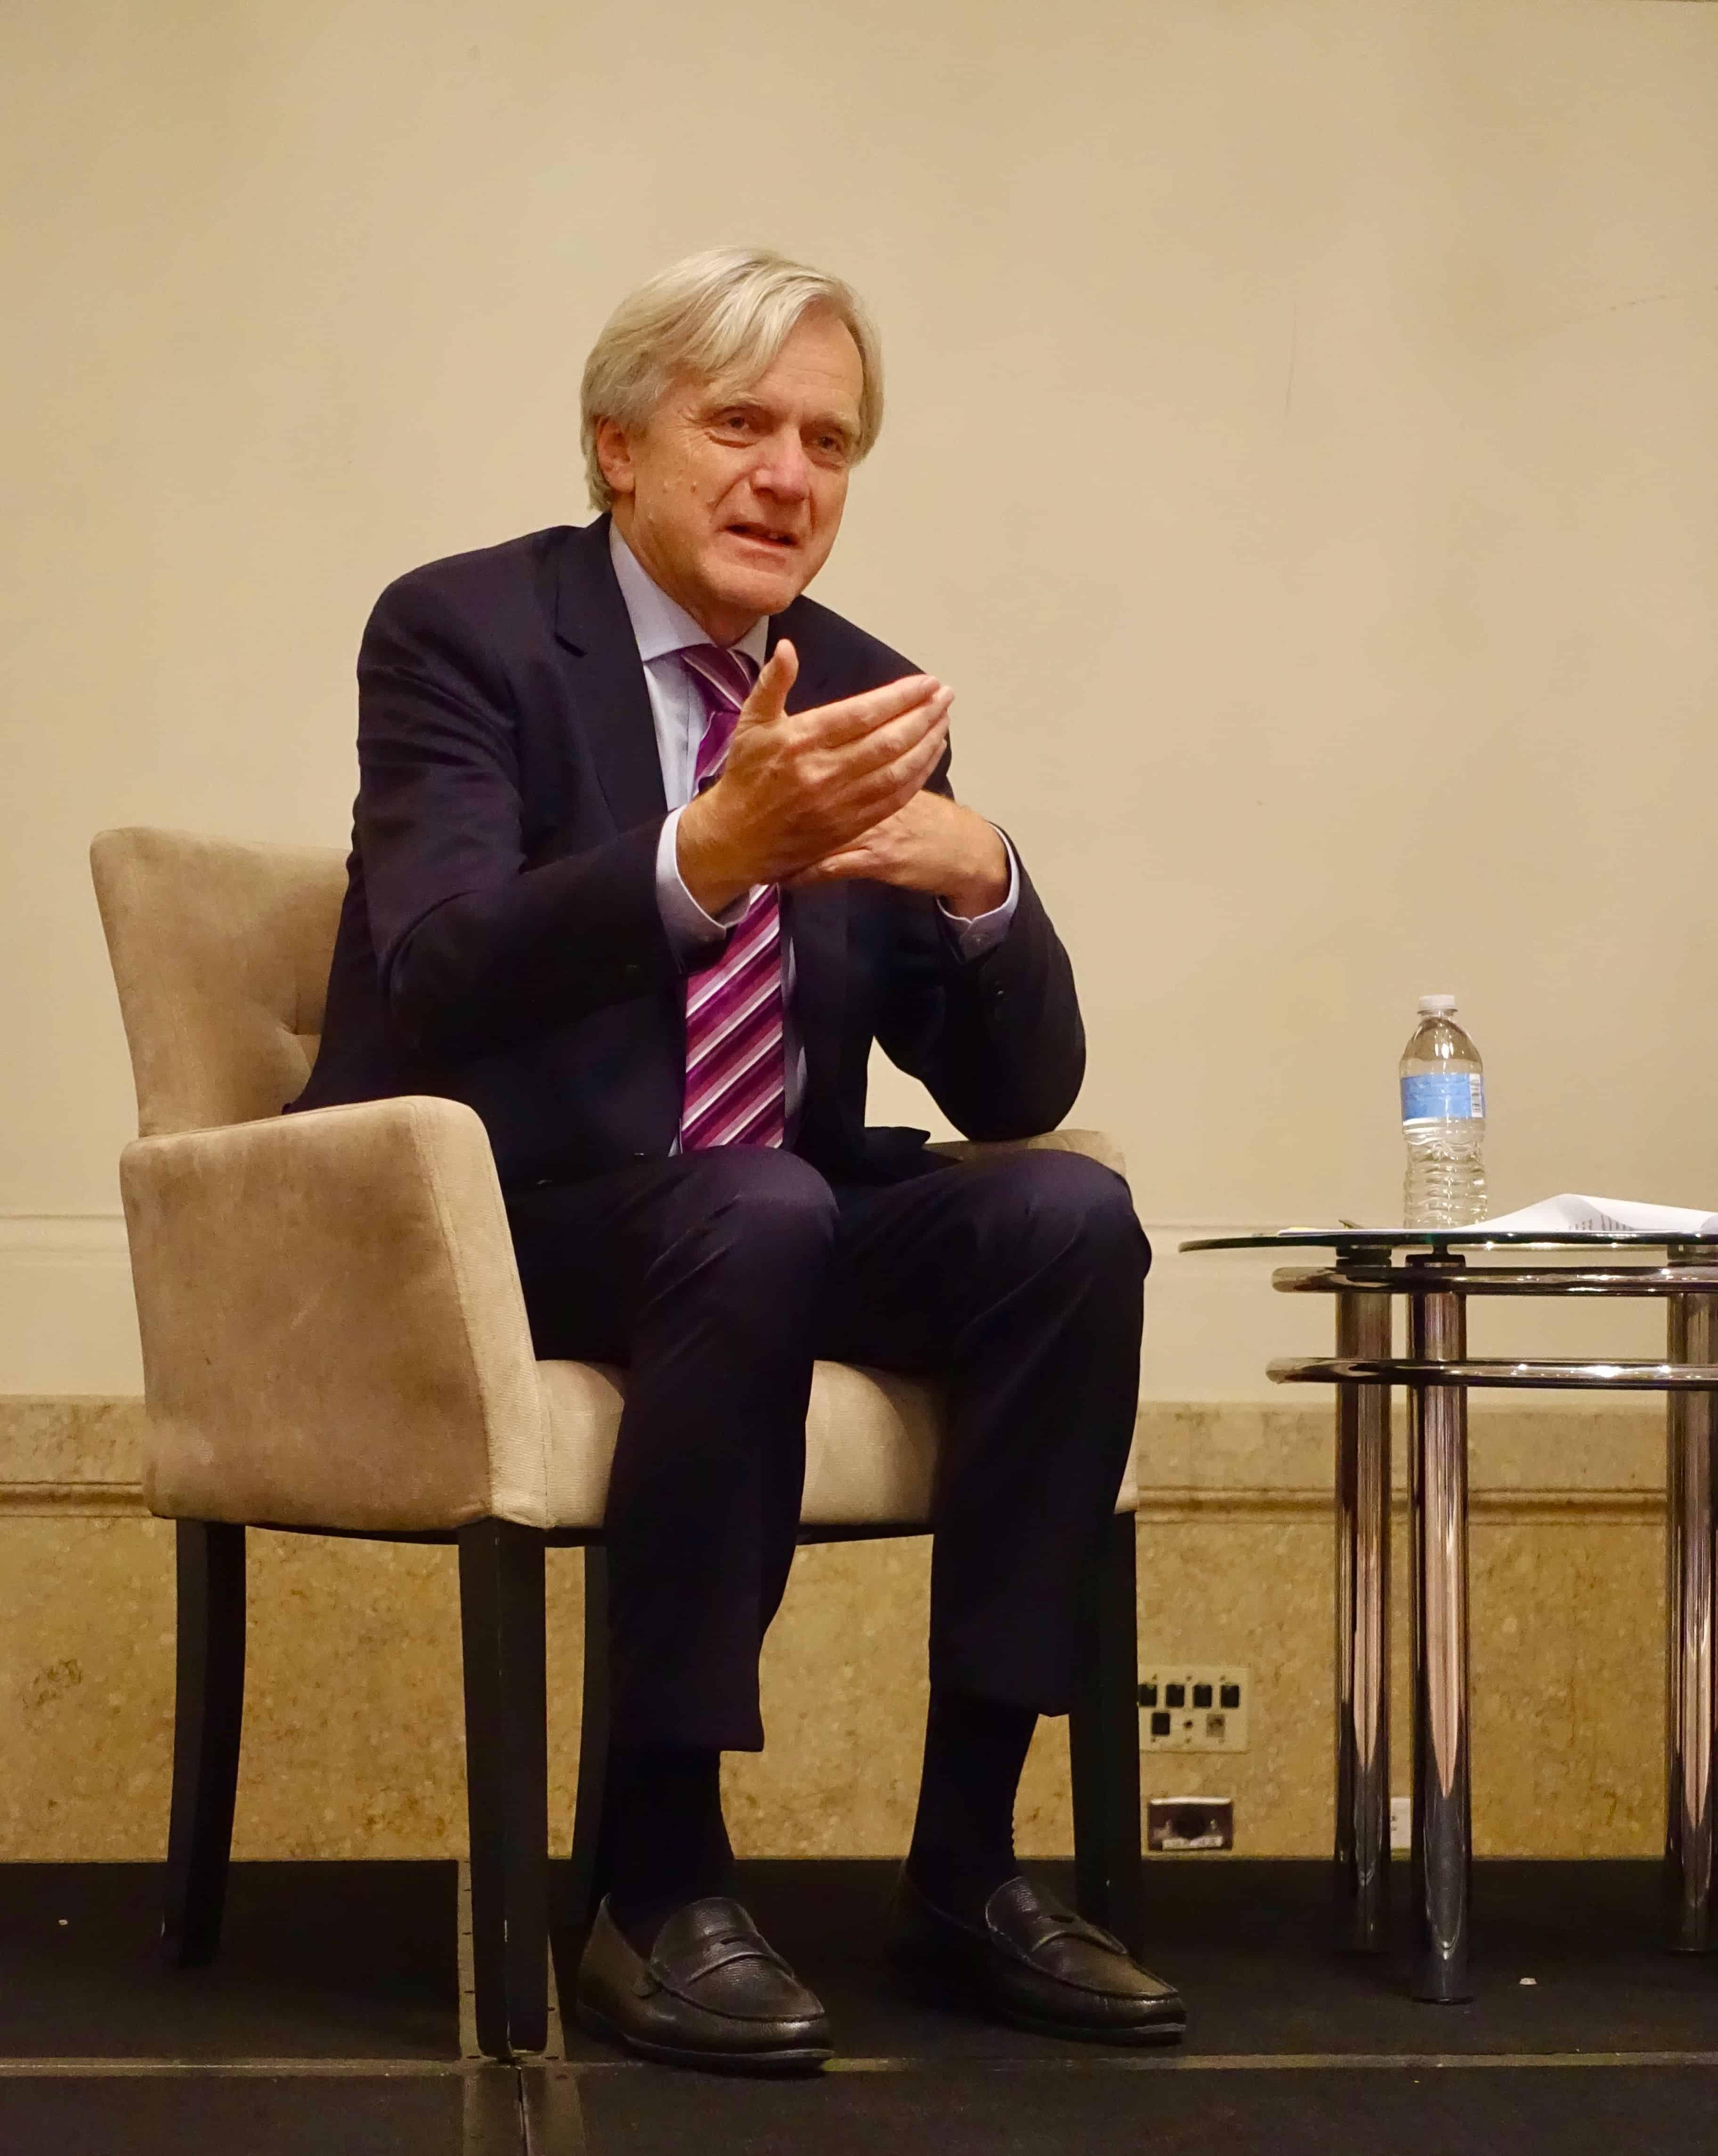 Andy Bechtolsheim, first investor for Google